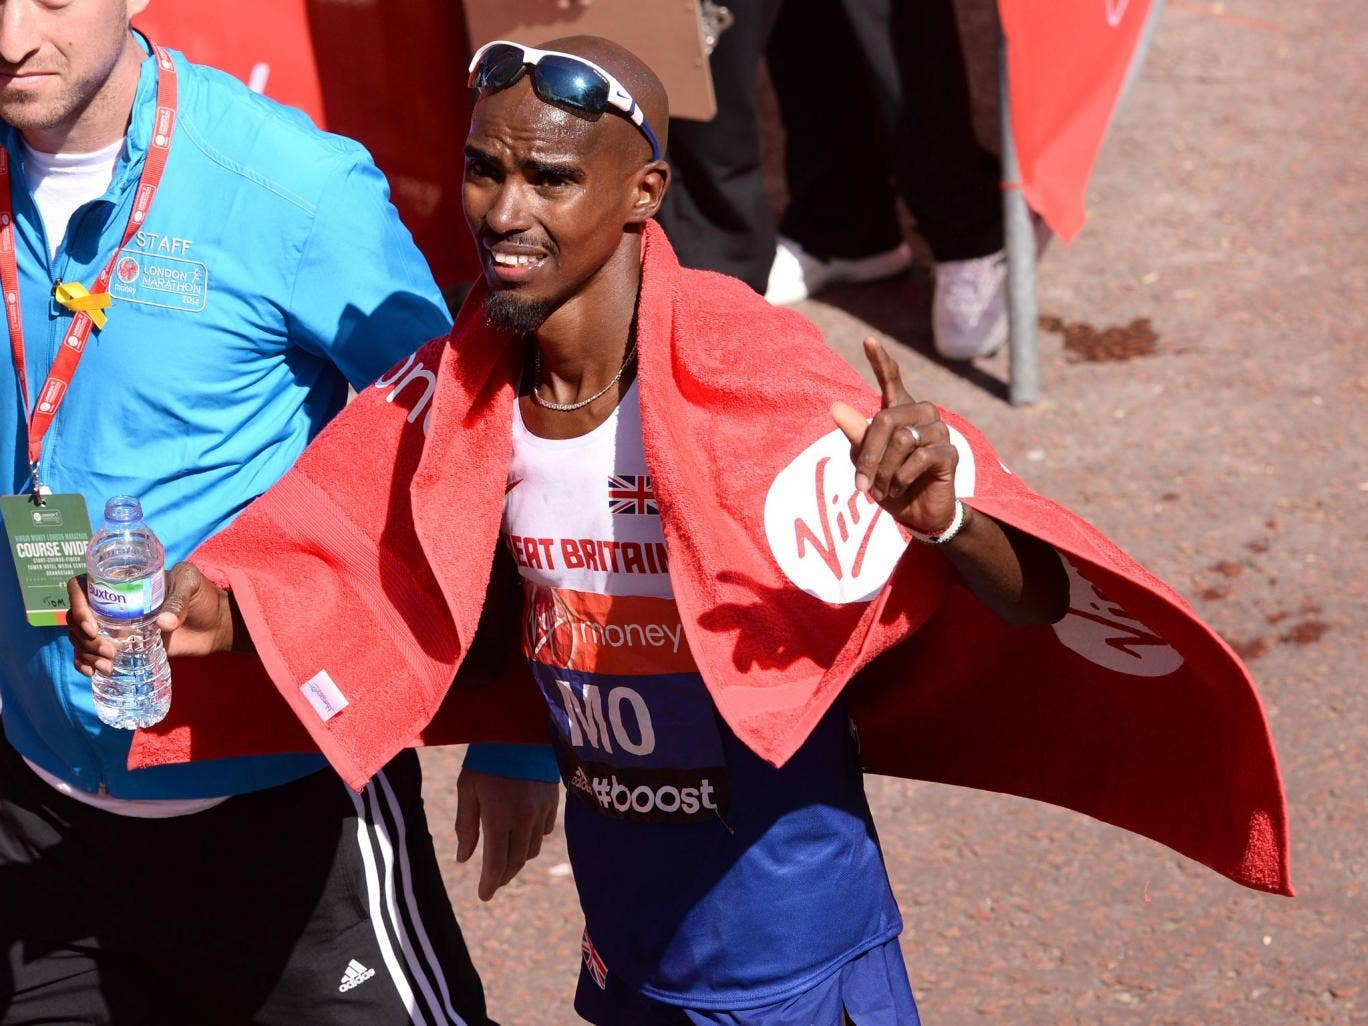 Mo Farah salutes the crowd after his London Marathon debut